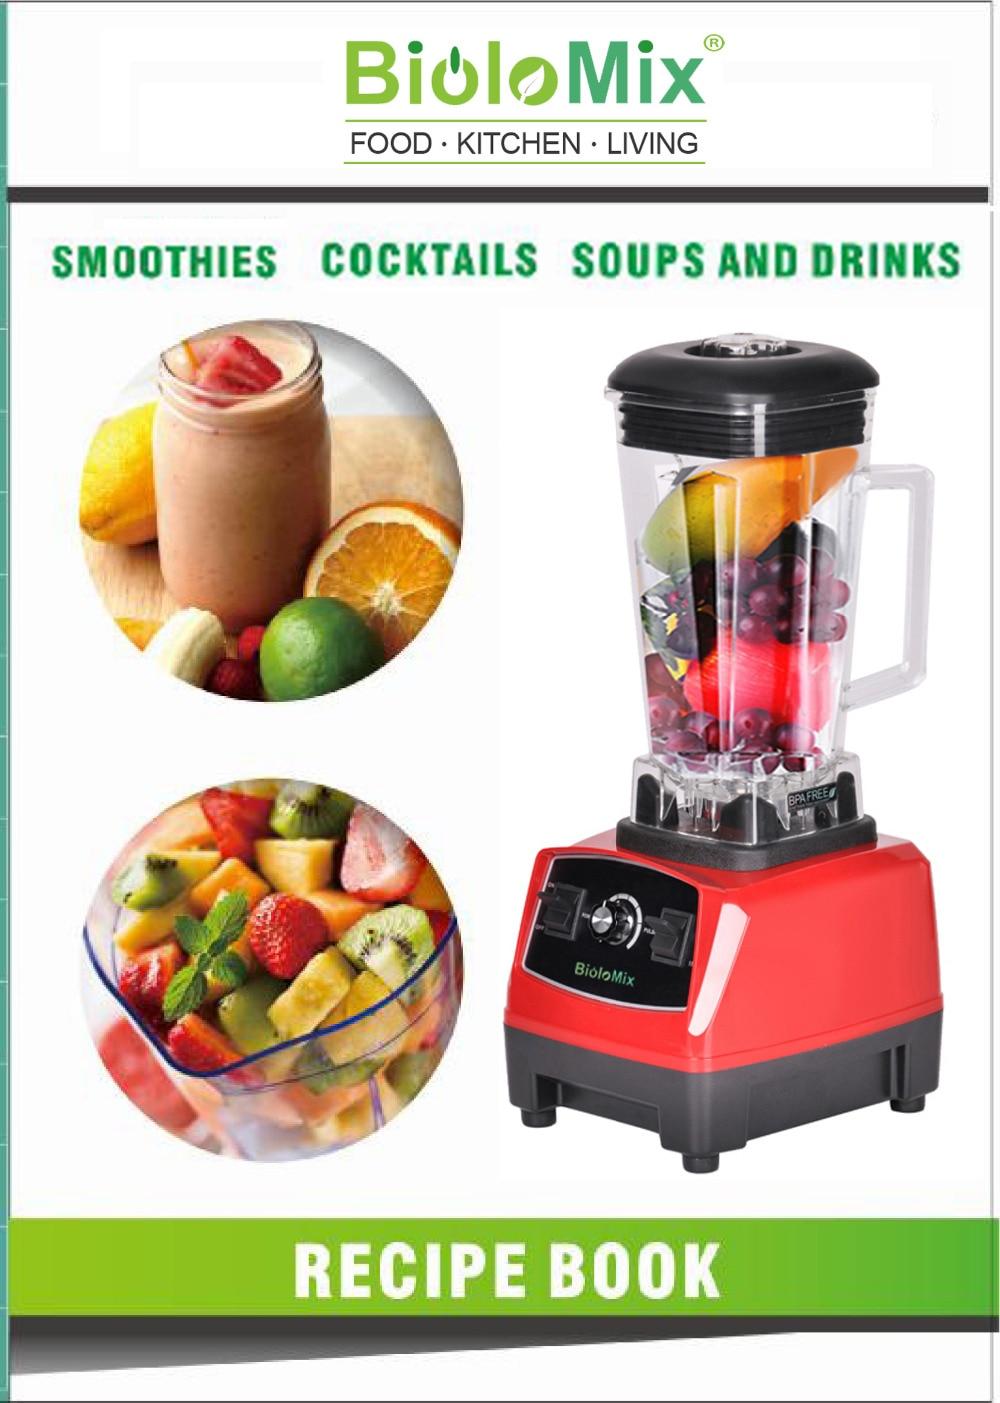 HTB12vXsmYsrBKNjSZFpq6AXhFXa3 BPA Free 3HP 2200W Heavy Duty Commercial Grade Blender Mixer Juicer High Power Food Processor Ice Smoothie Bar Fruit Blender